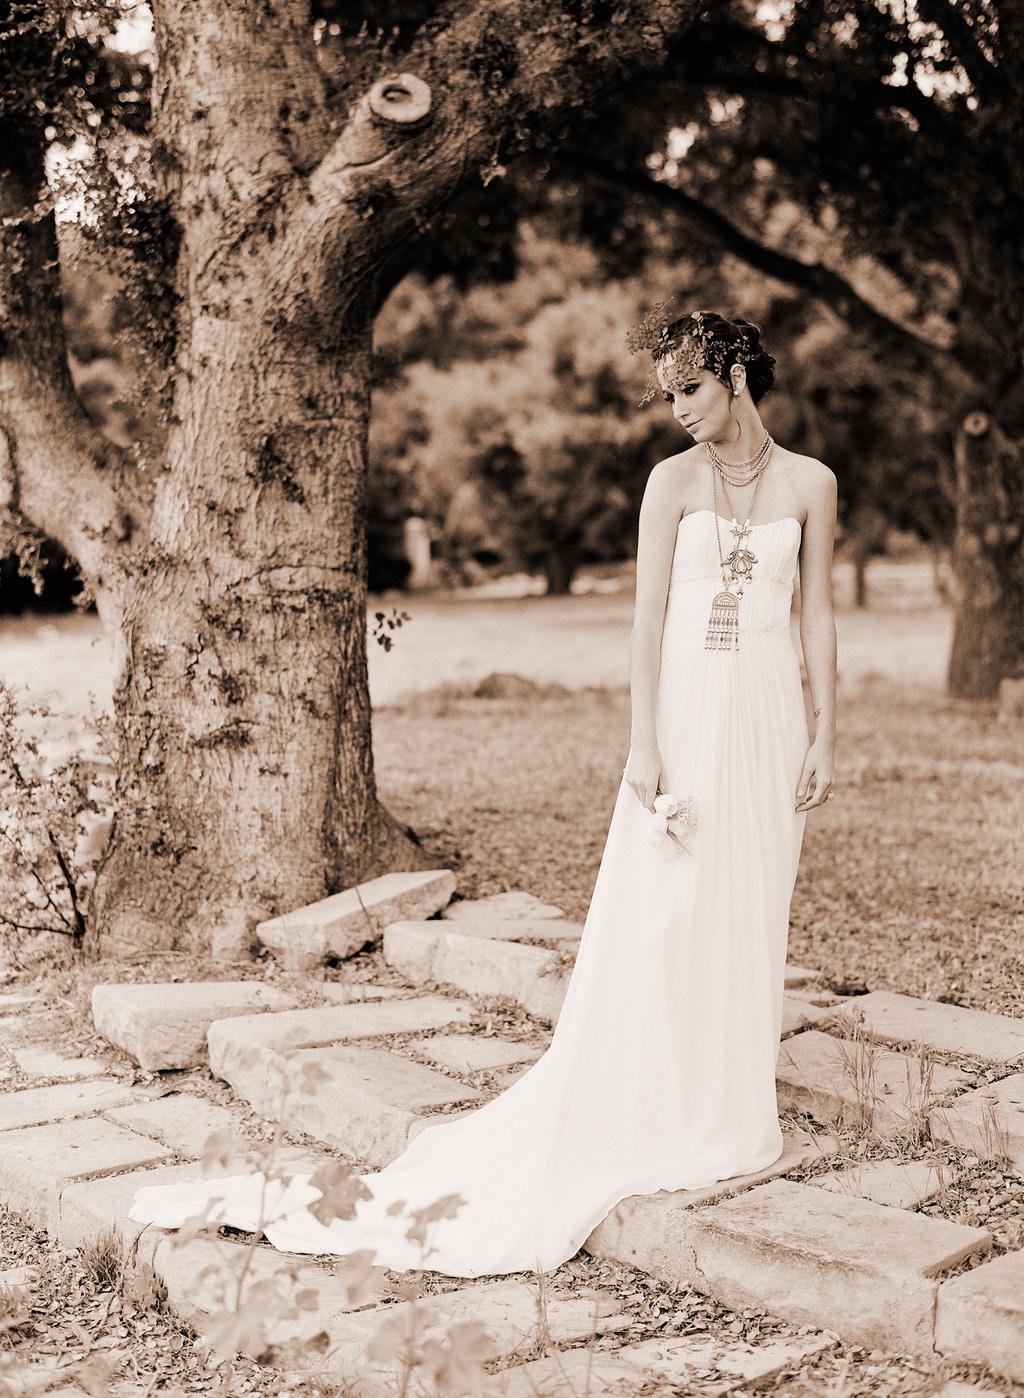 Styled-wedding-santa-barbara-chic-beaux-arts-phtographie-italian-bohemian-wedding-bride-wedding-dress--sepia-117.full